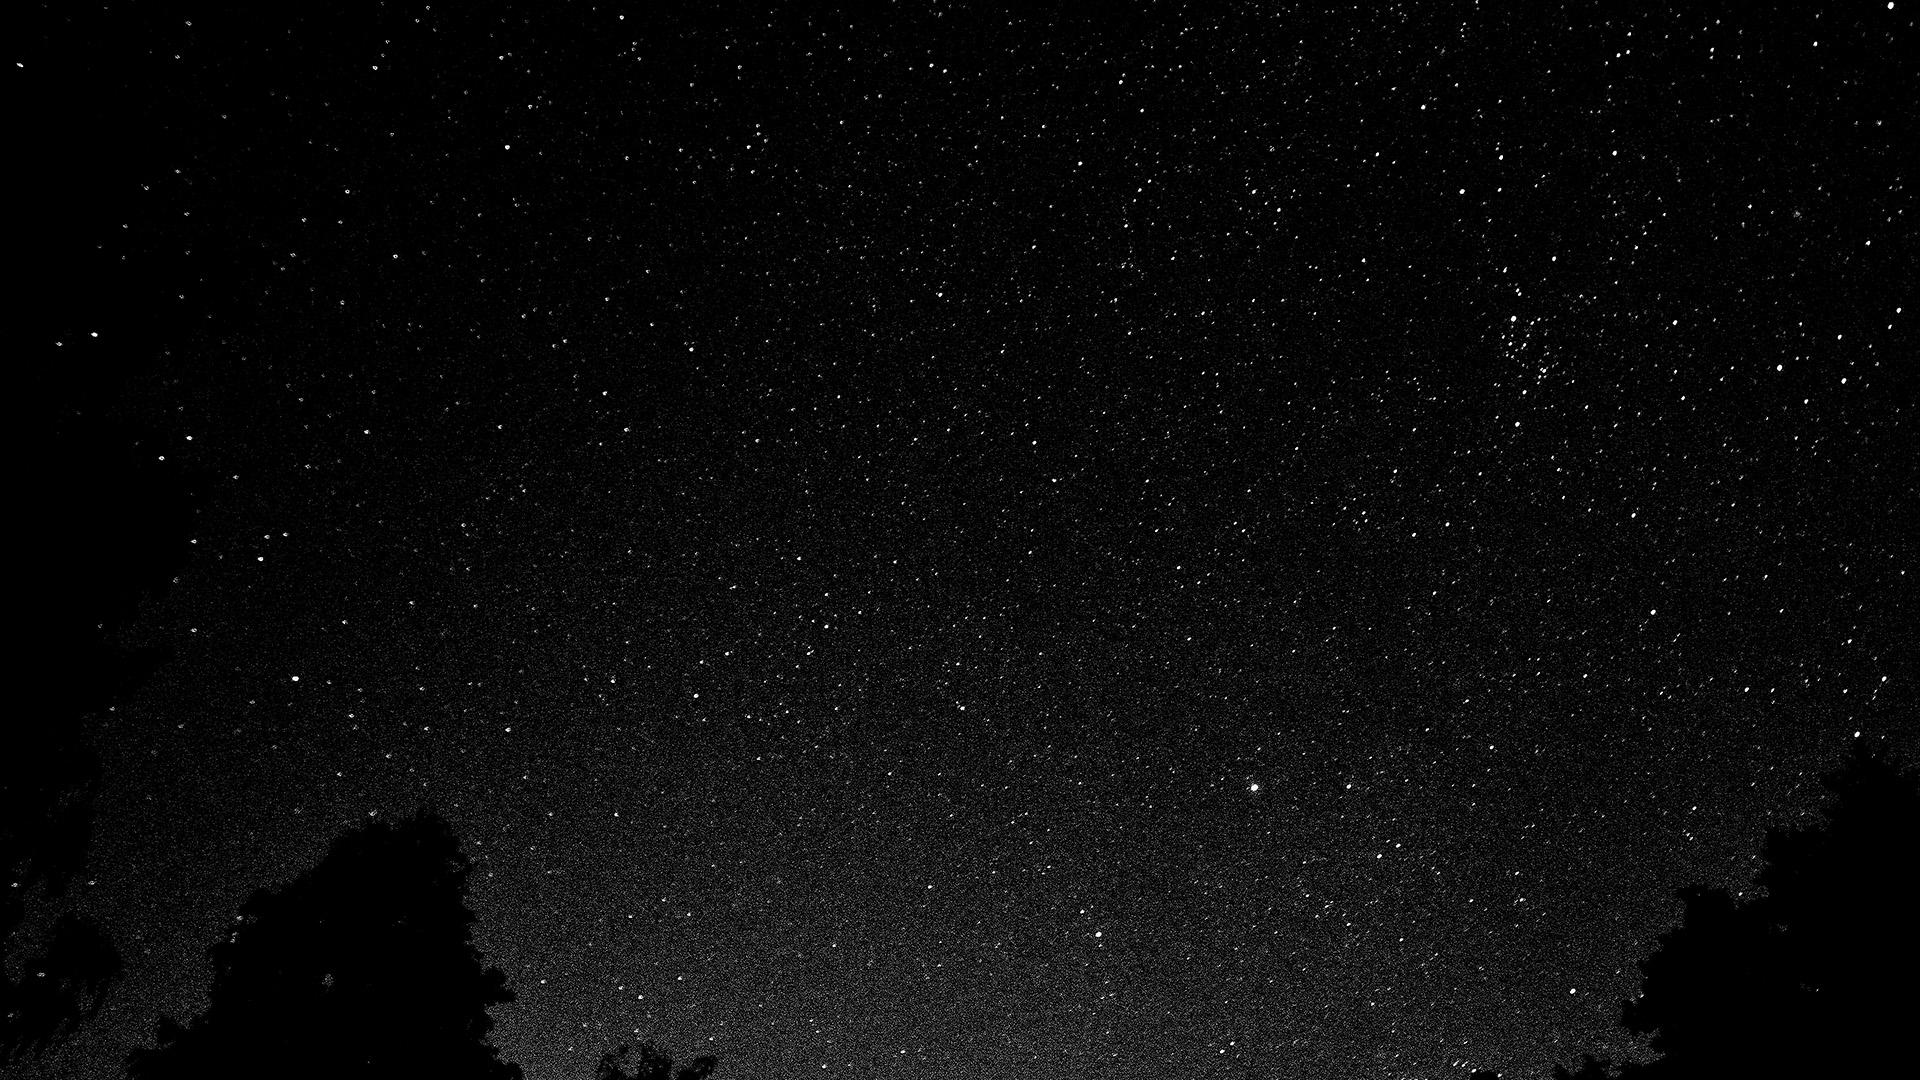 mt43-starry-night-sky-star-galaxy-space-white-black ...